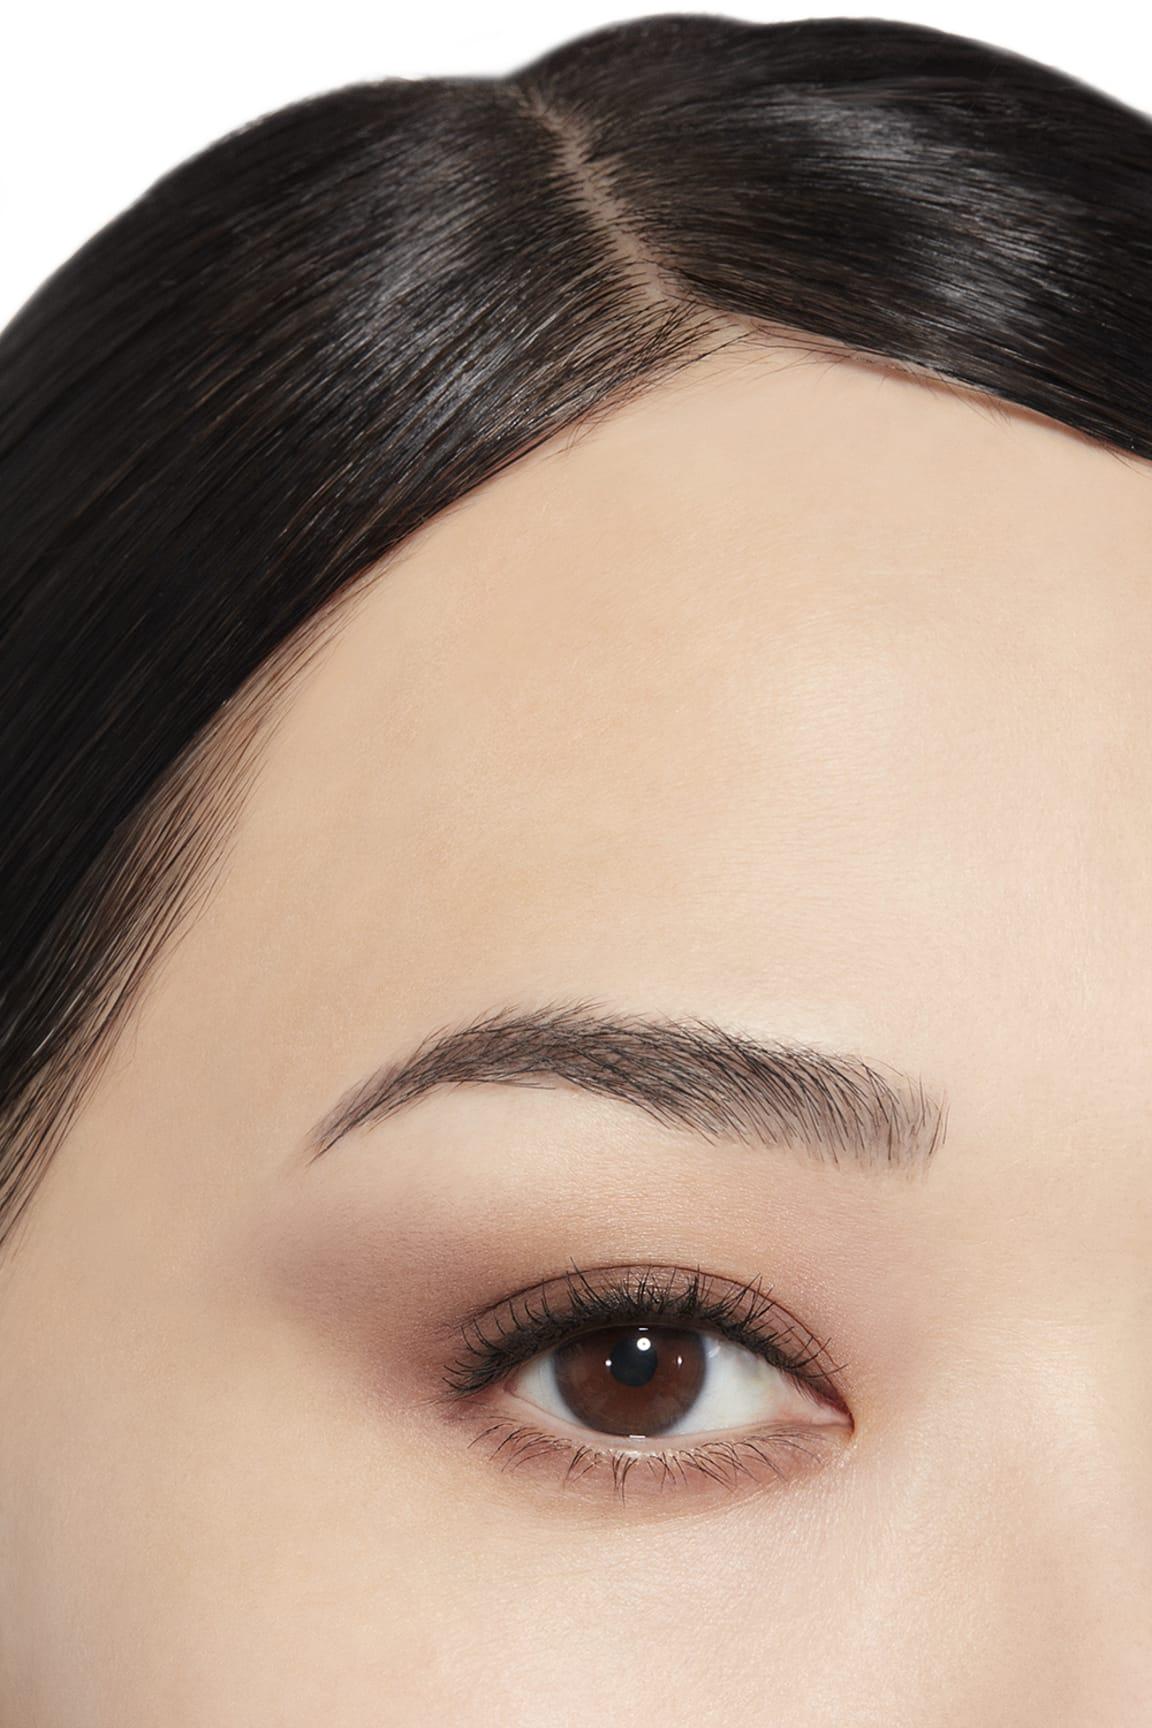 Application makeup visual 1 - LES BEIGES EYESHADOW PALETTE MEDIUM